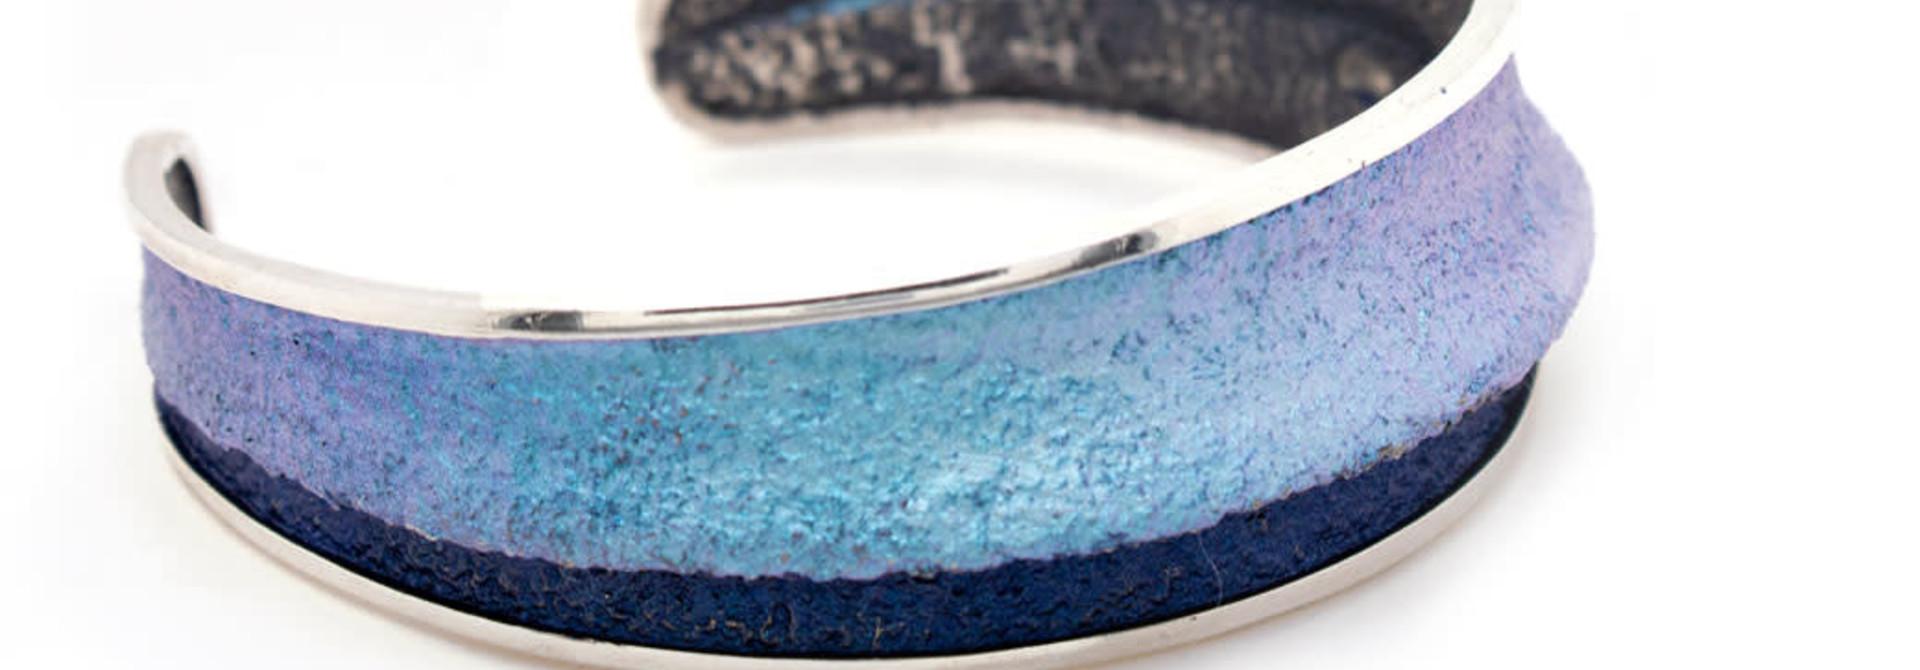 Troia blau Formentera Bracelet